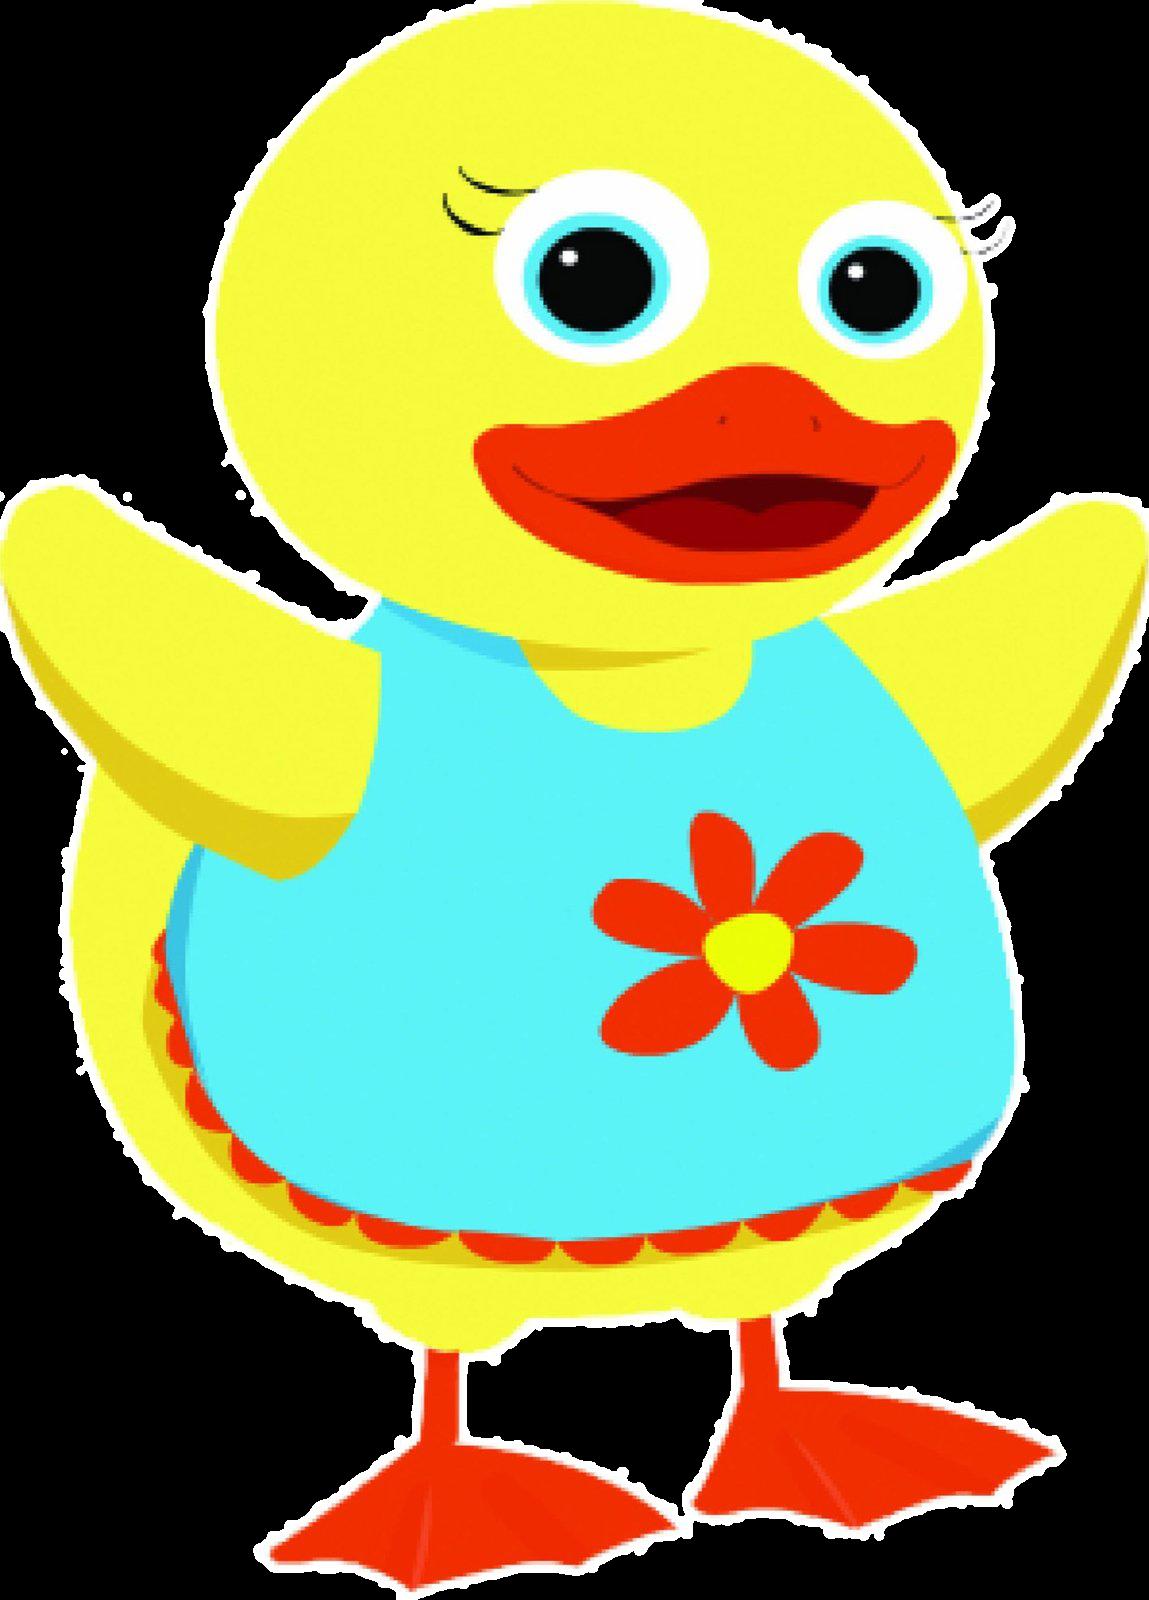 Ducks clipart suzy zoo. Cartoon characters babyfirst